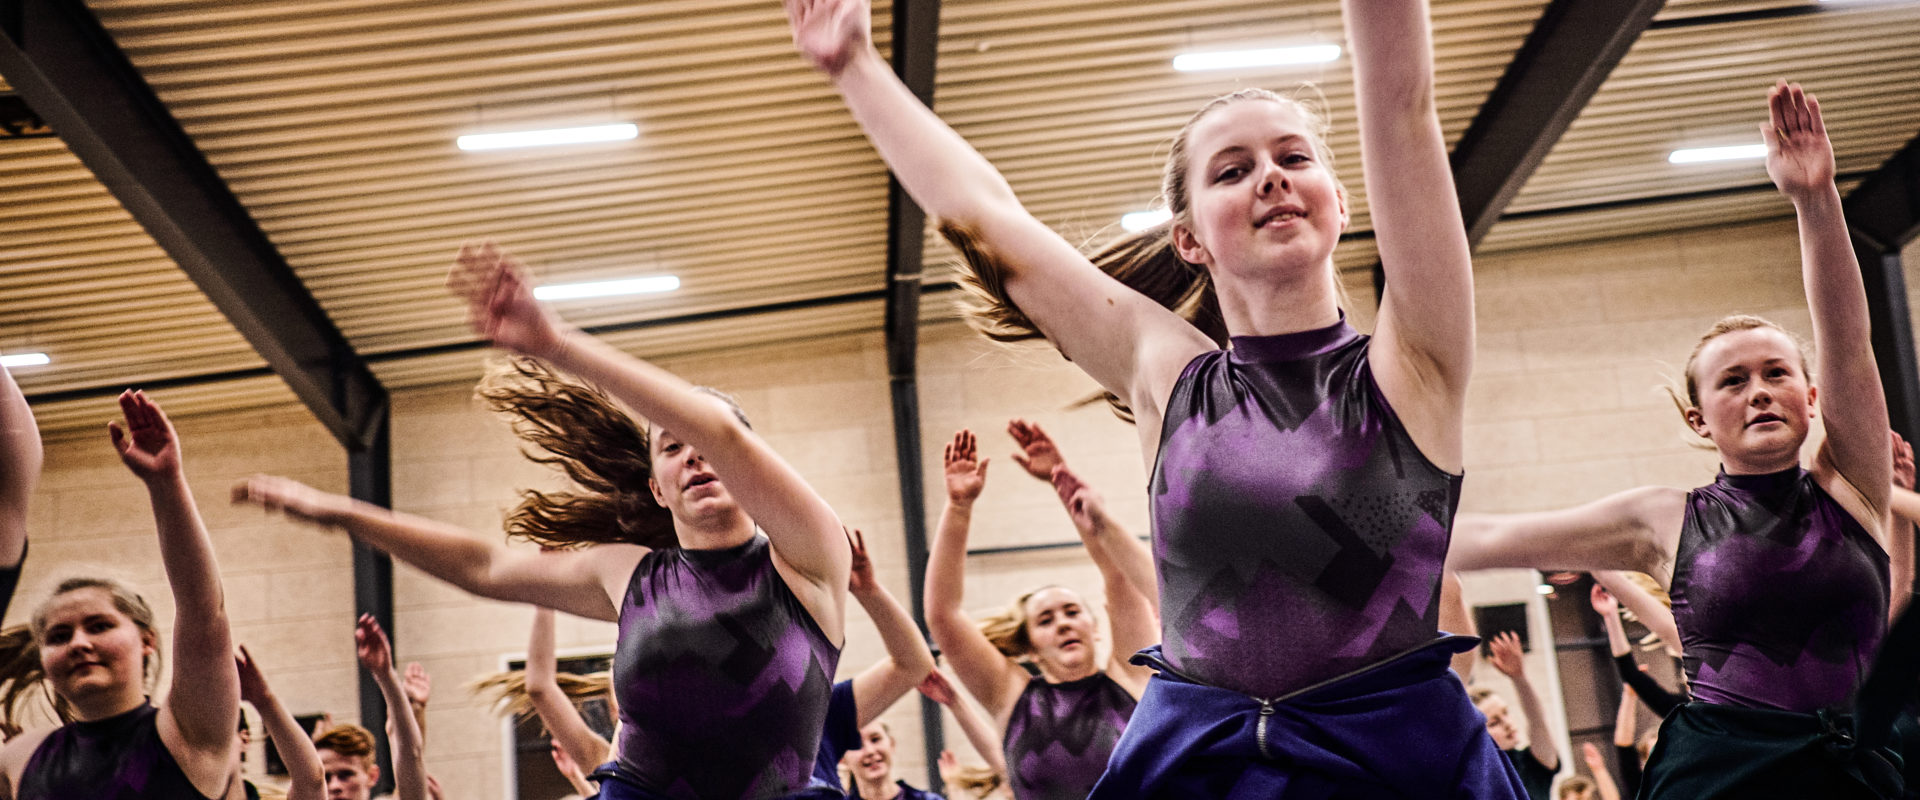 Pigegymnastik på efterskole